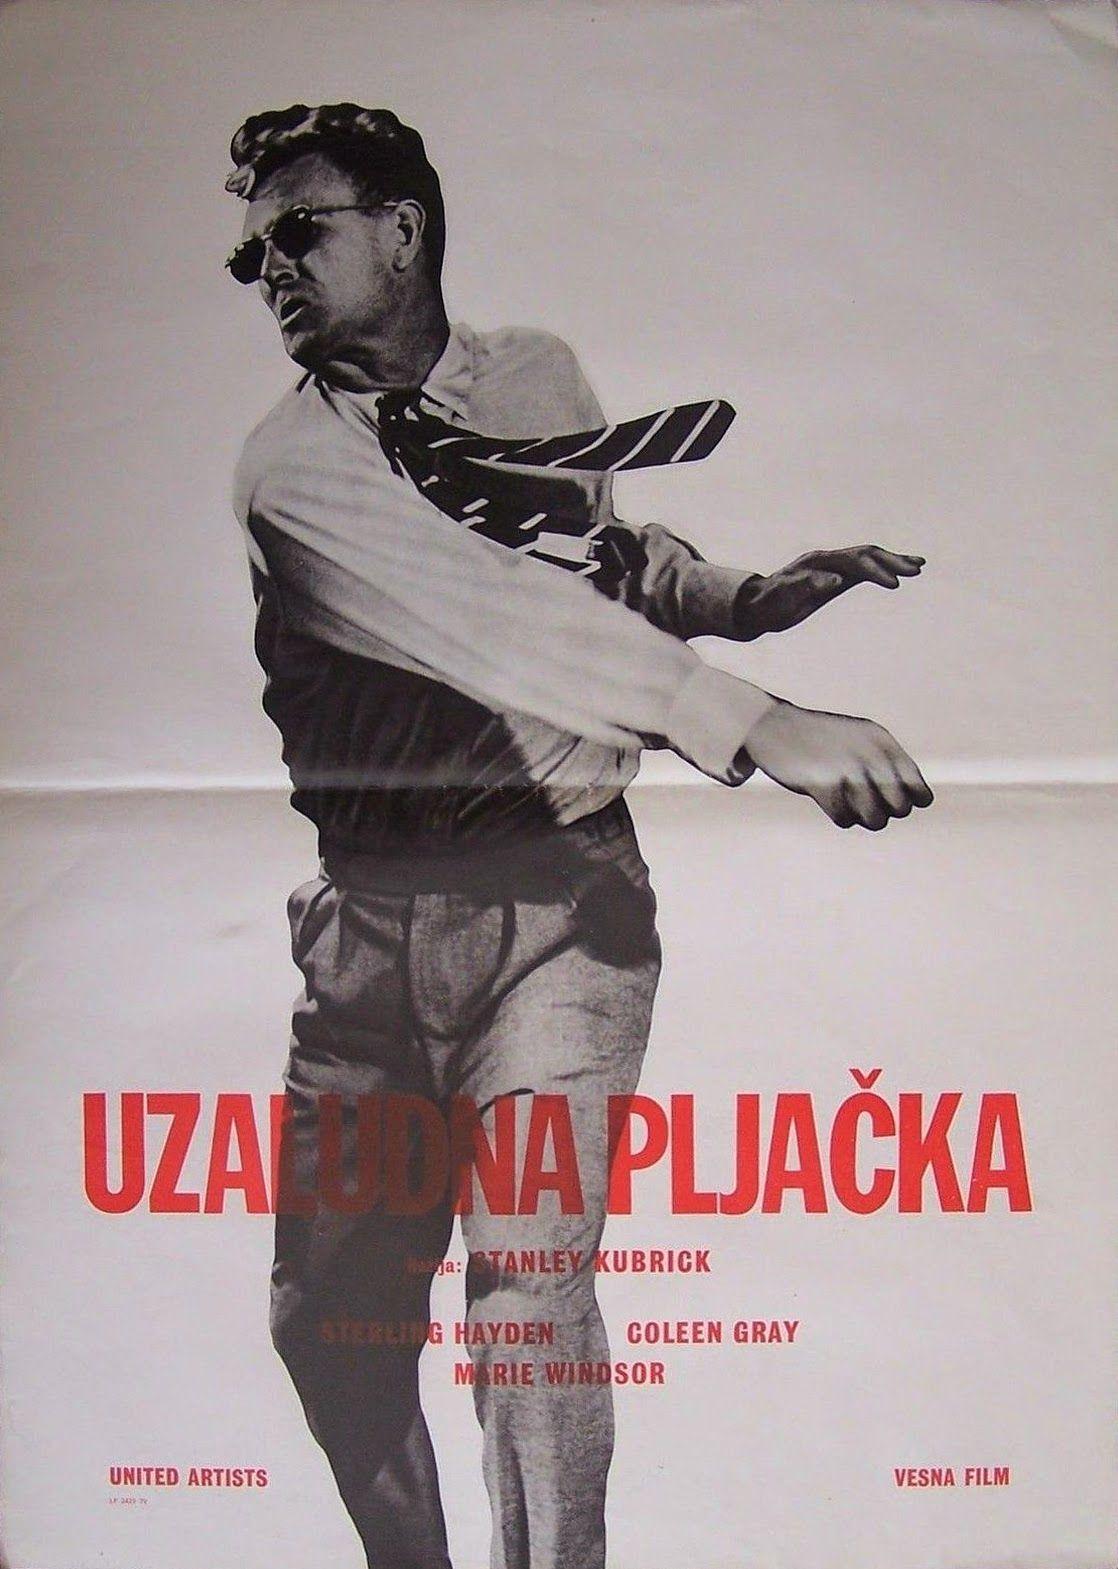 The Killing (Stanley Kubrick, 1956) Yugoslavian design